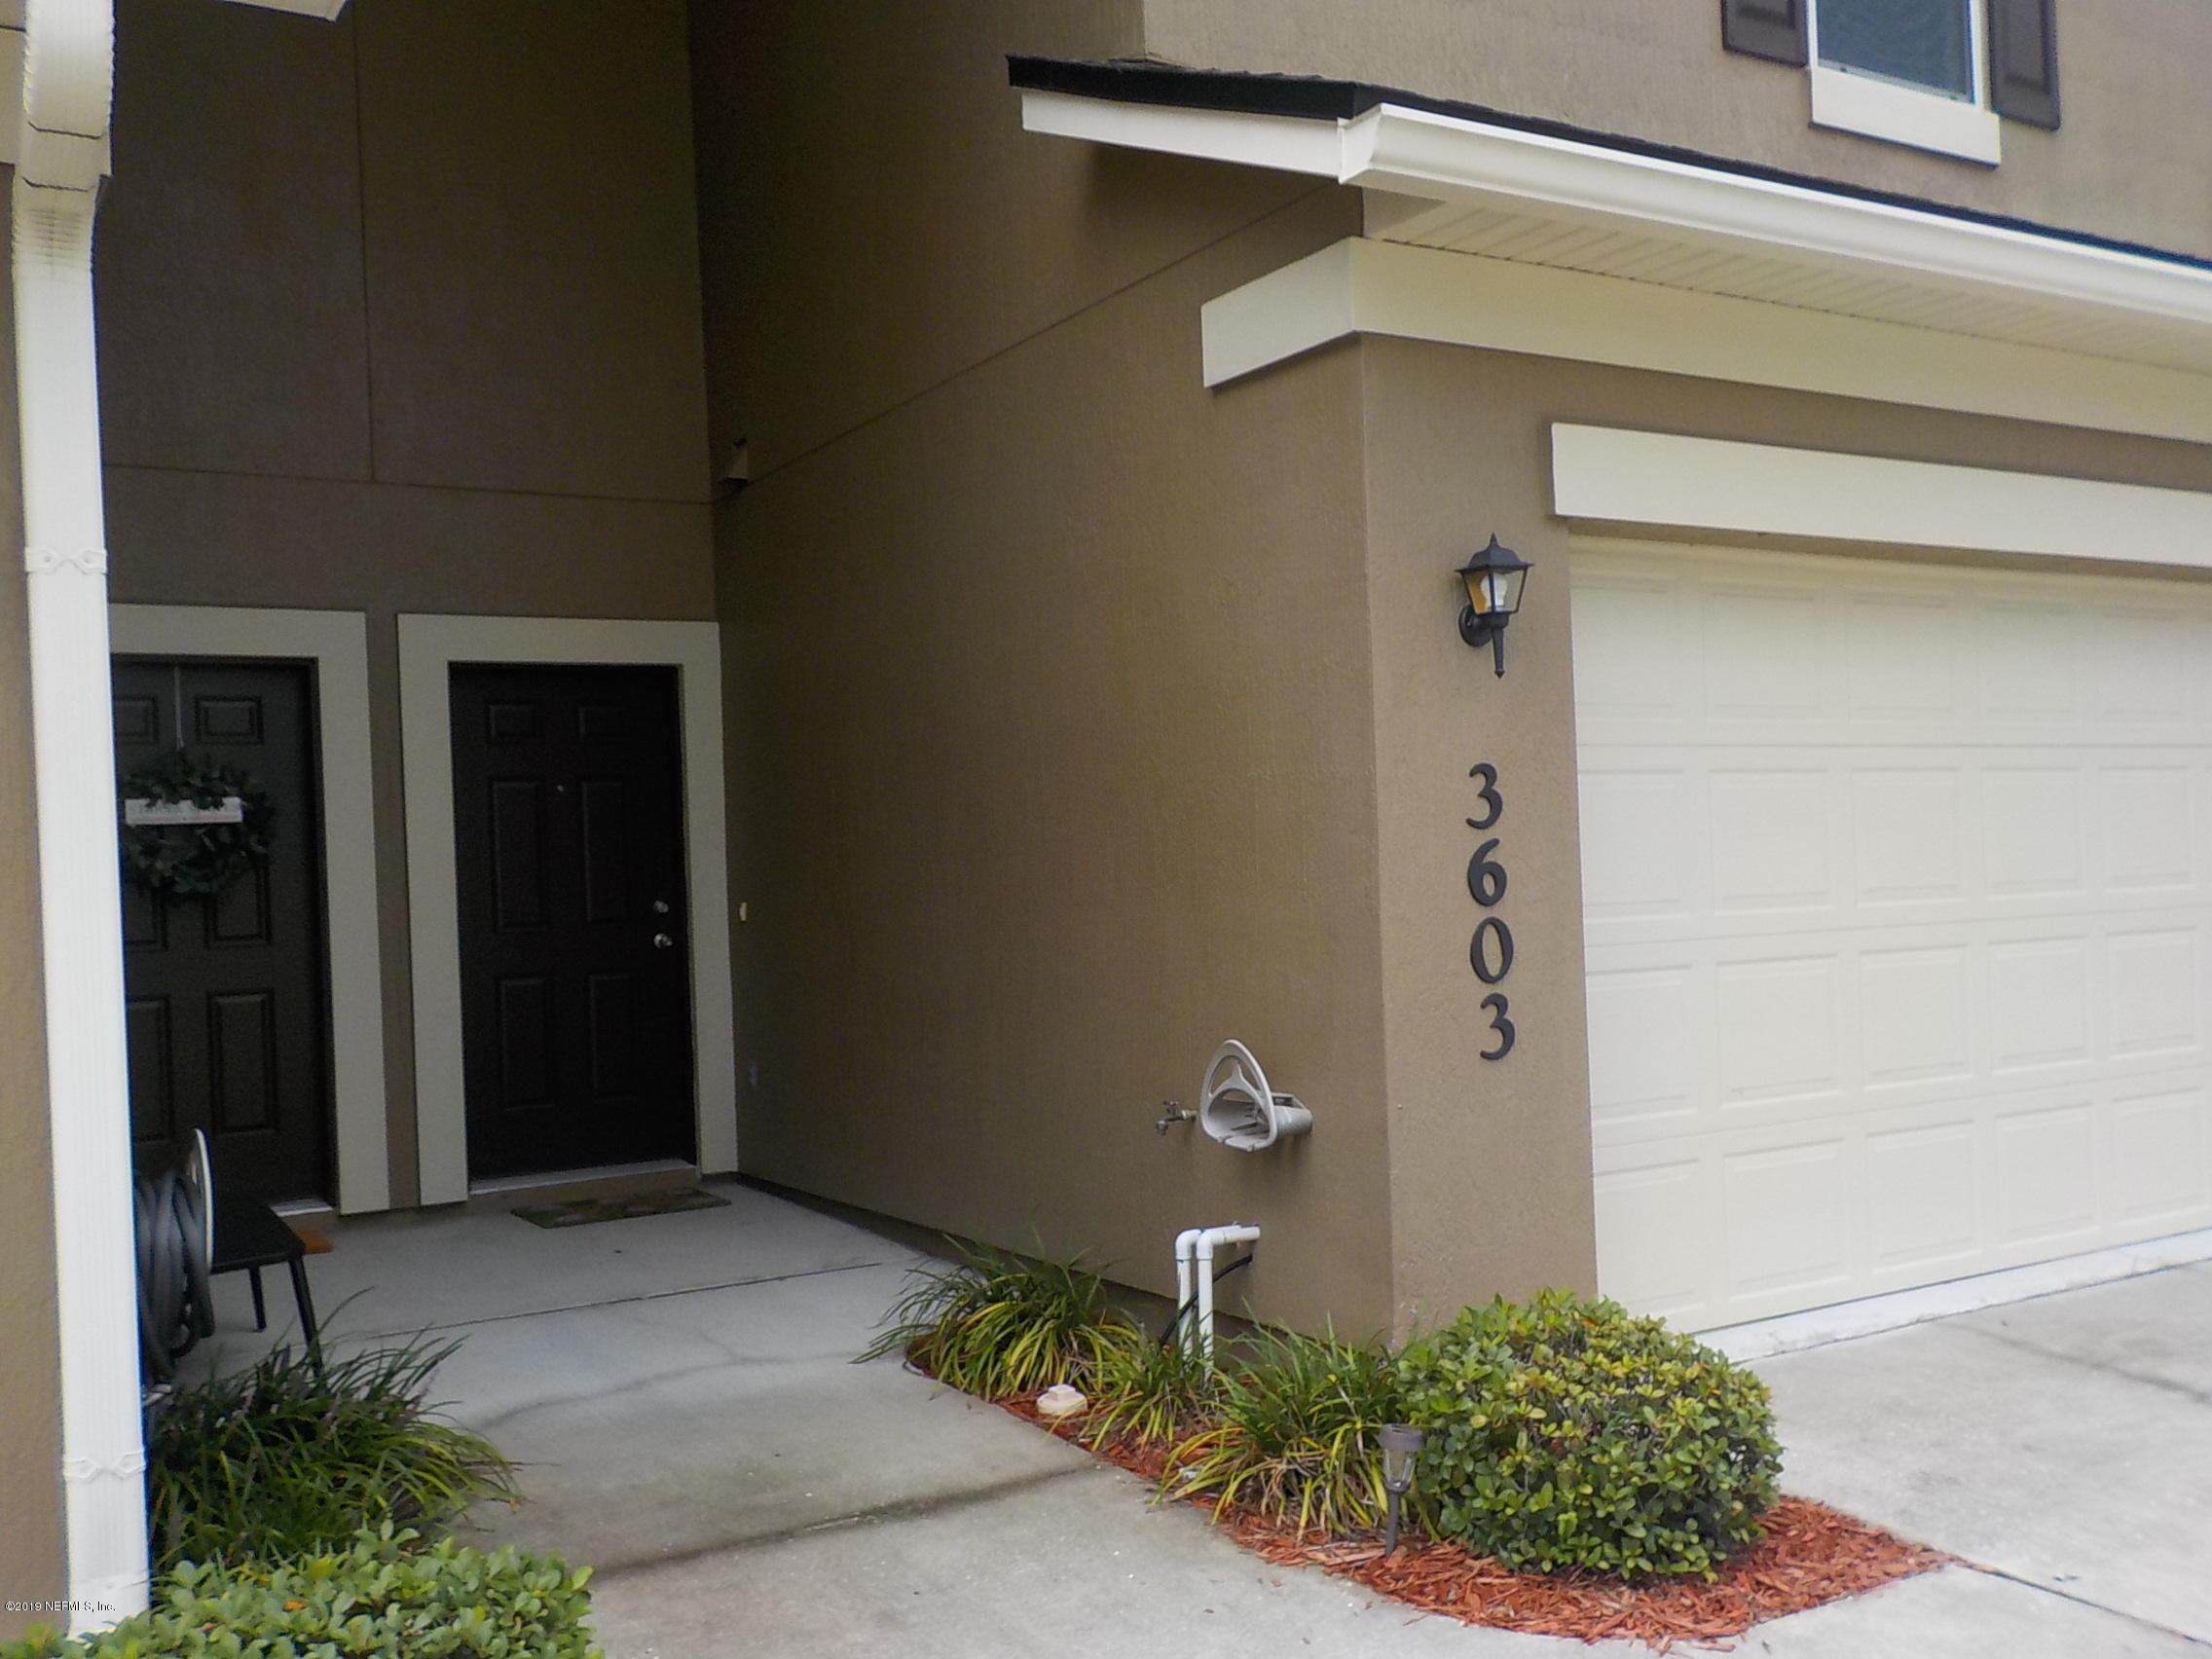 Fleming Island, FL Homes for Sale 100K – 200K: Listing Report